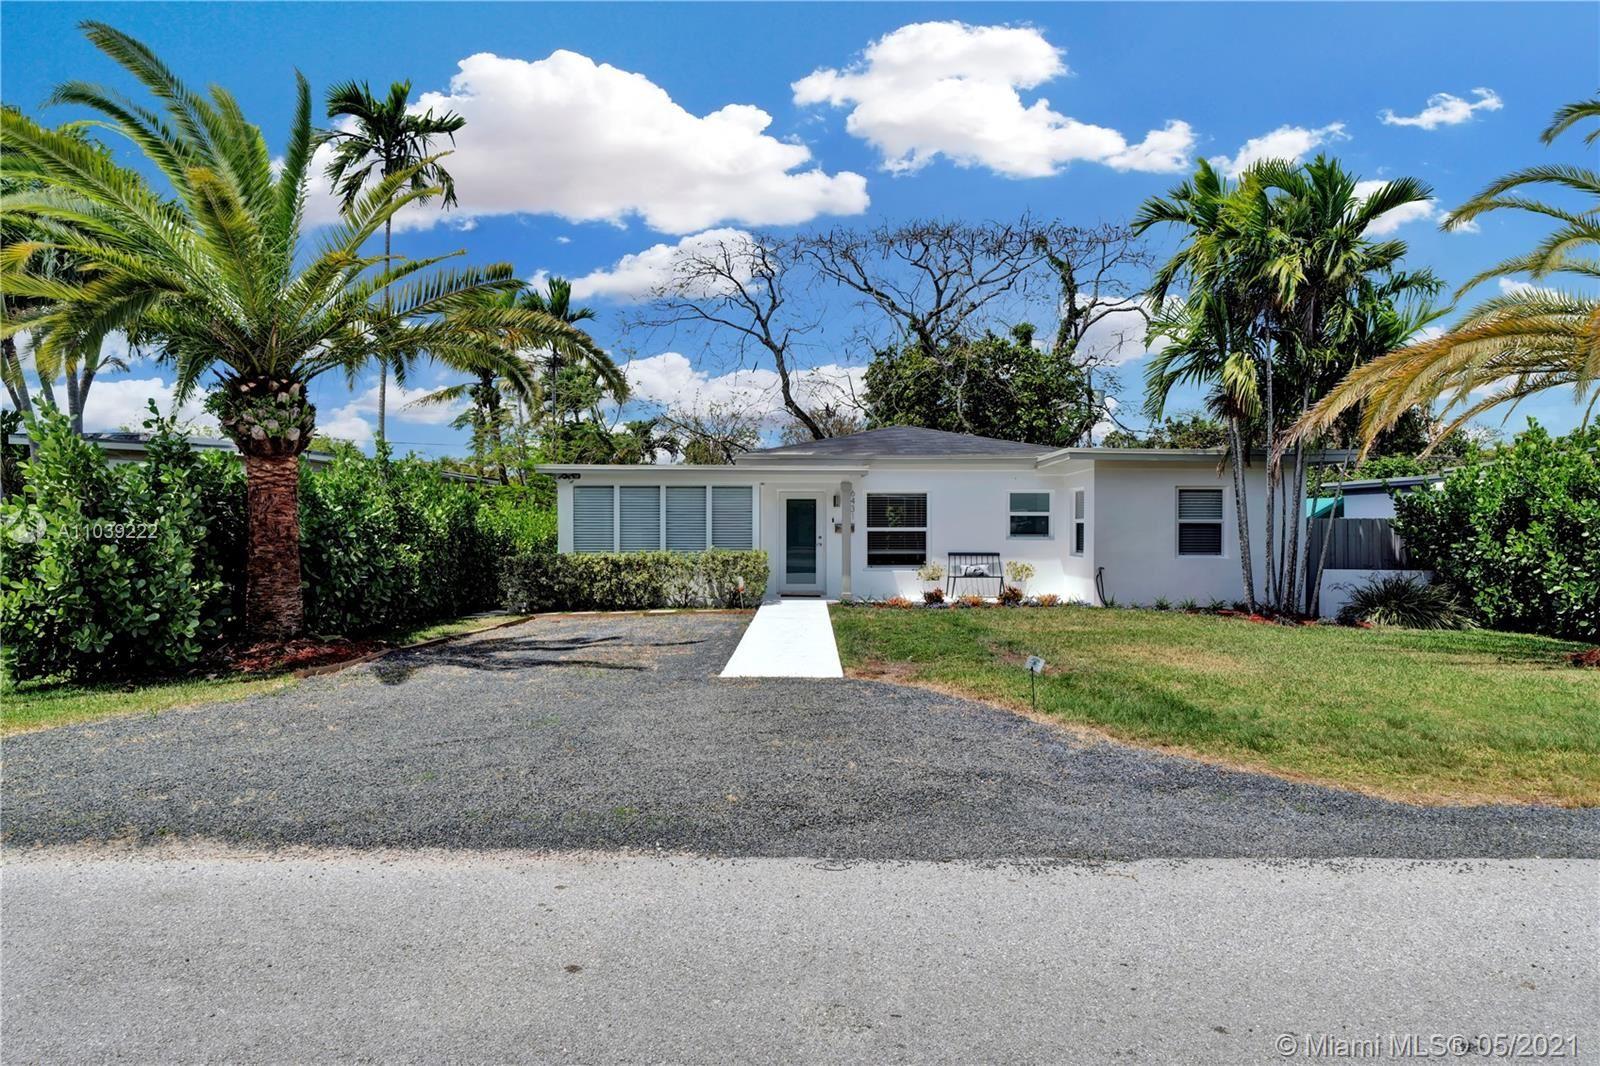 Photo of 6431 SW 43rd St, Miami, FL 33155 (MLS # A11039222)